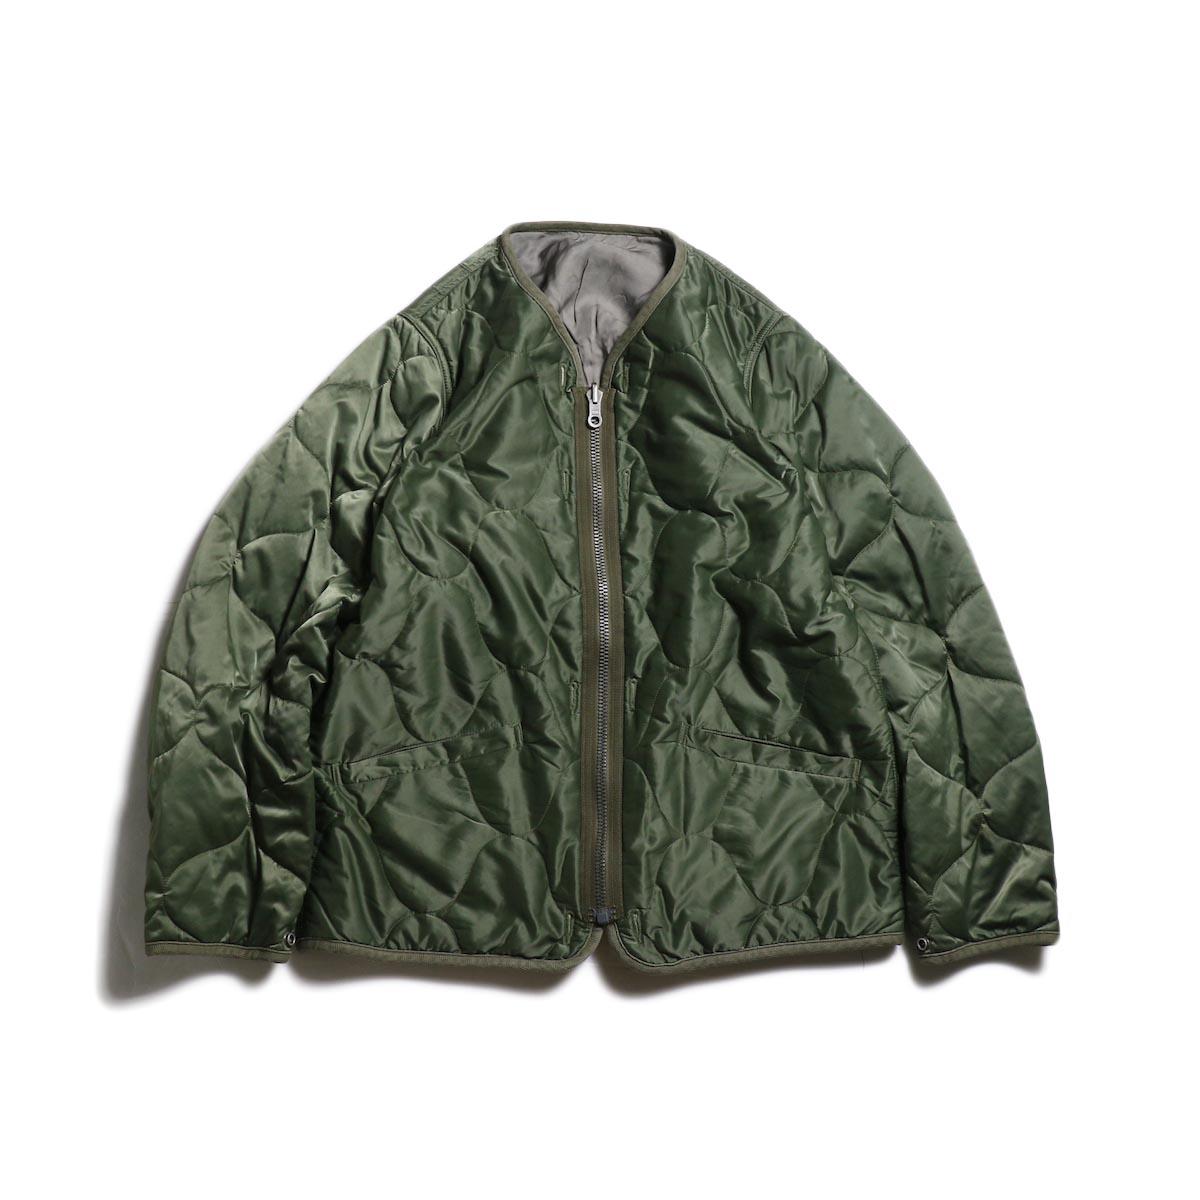 visvim / IRIS LINER JKT -Green